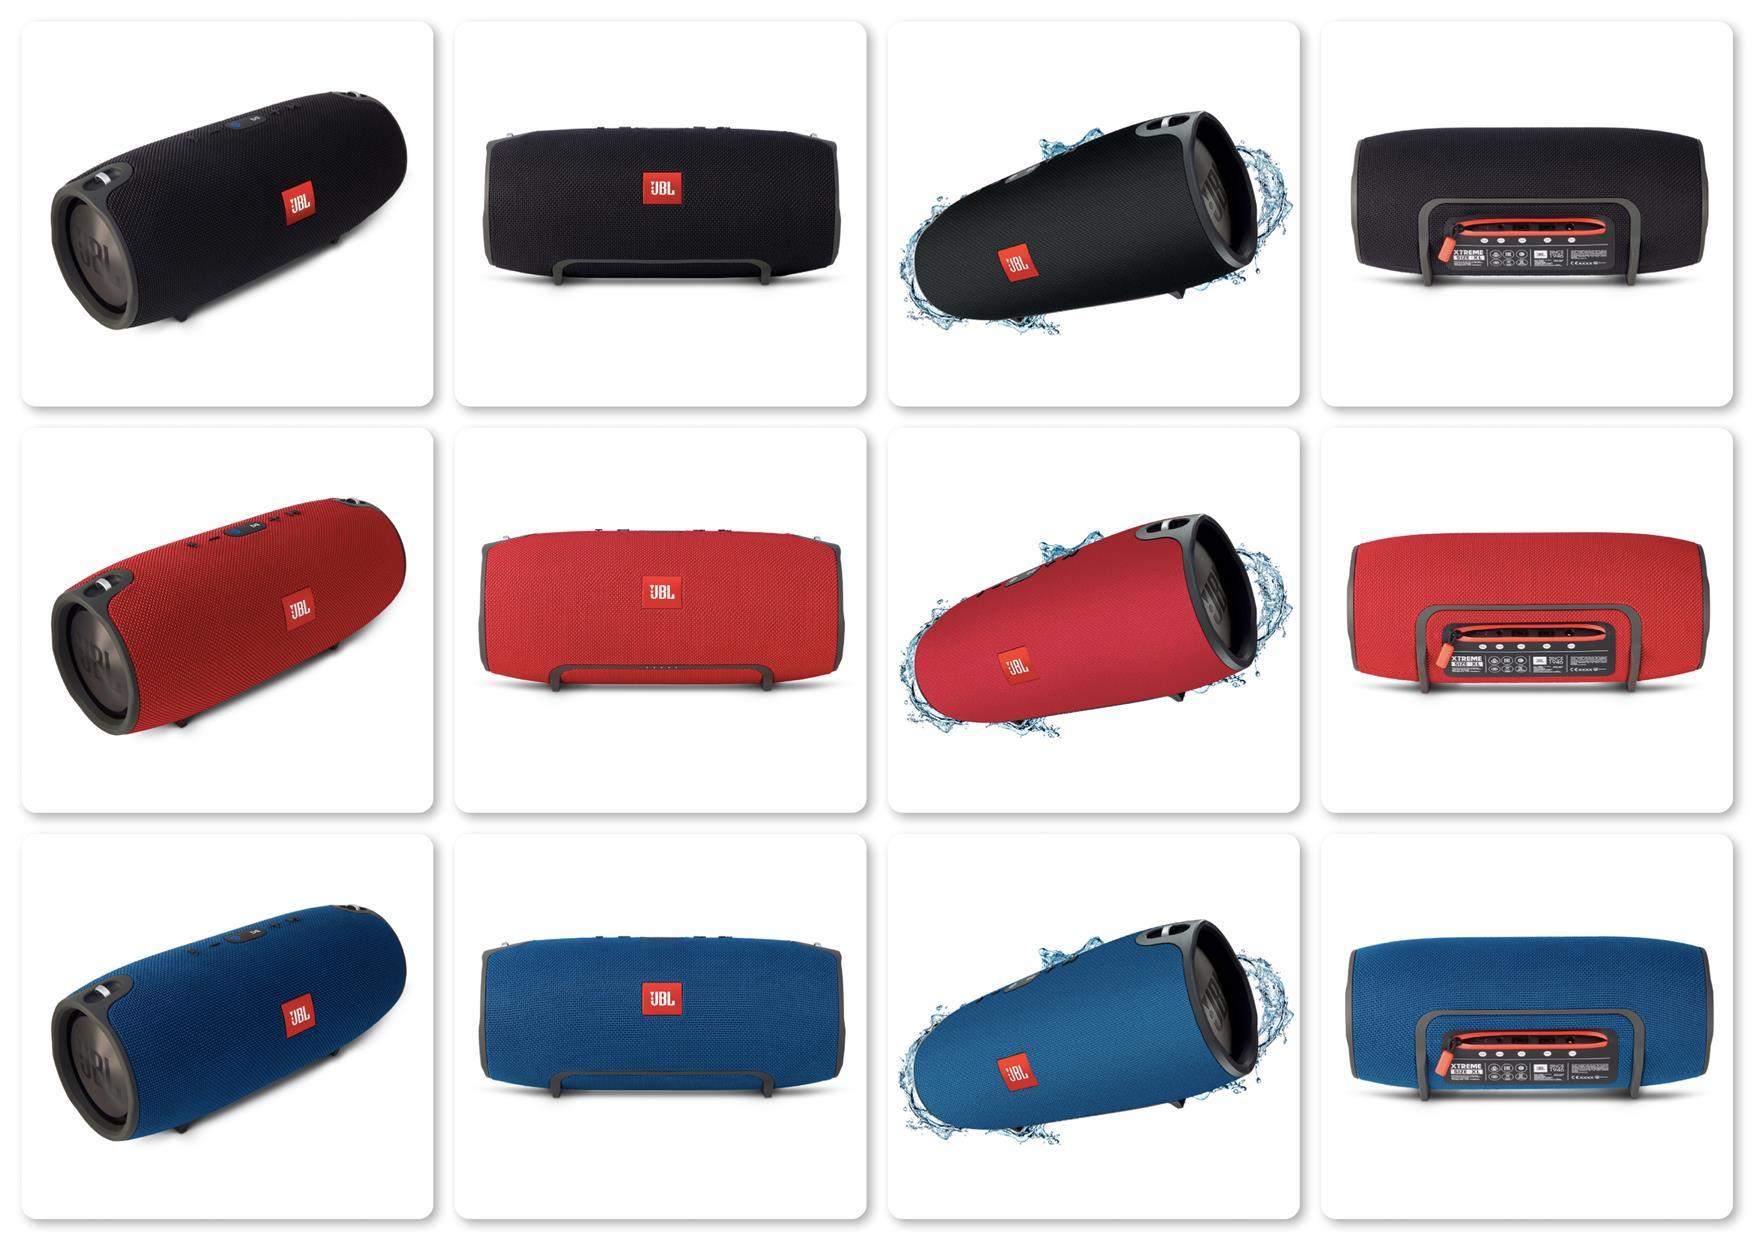 jbl xtreme portable bluetooth speaker. original jbl xtreme splashproof portable bluetooth wireless headphone jbl speaker -